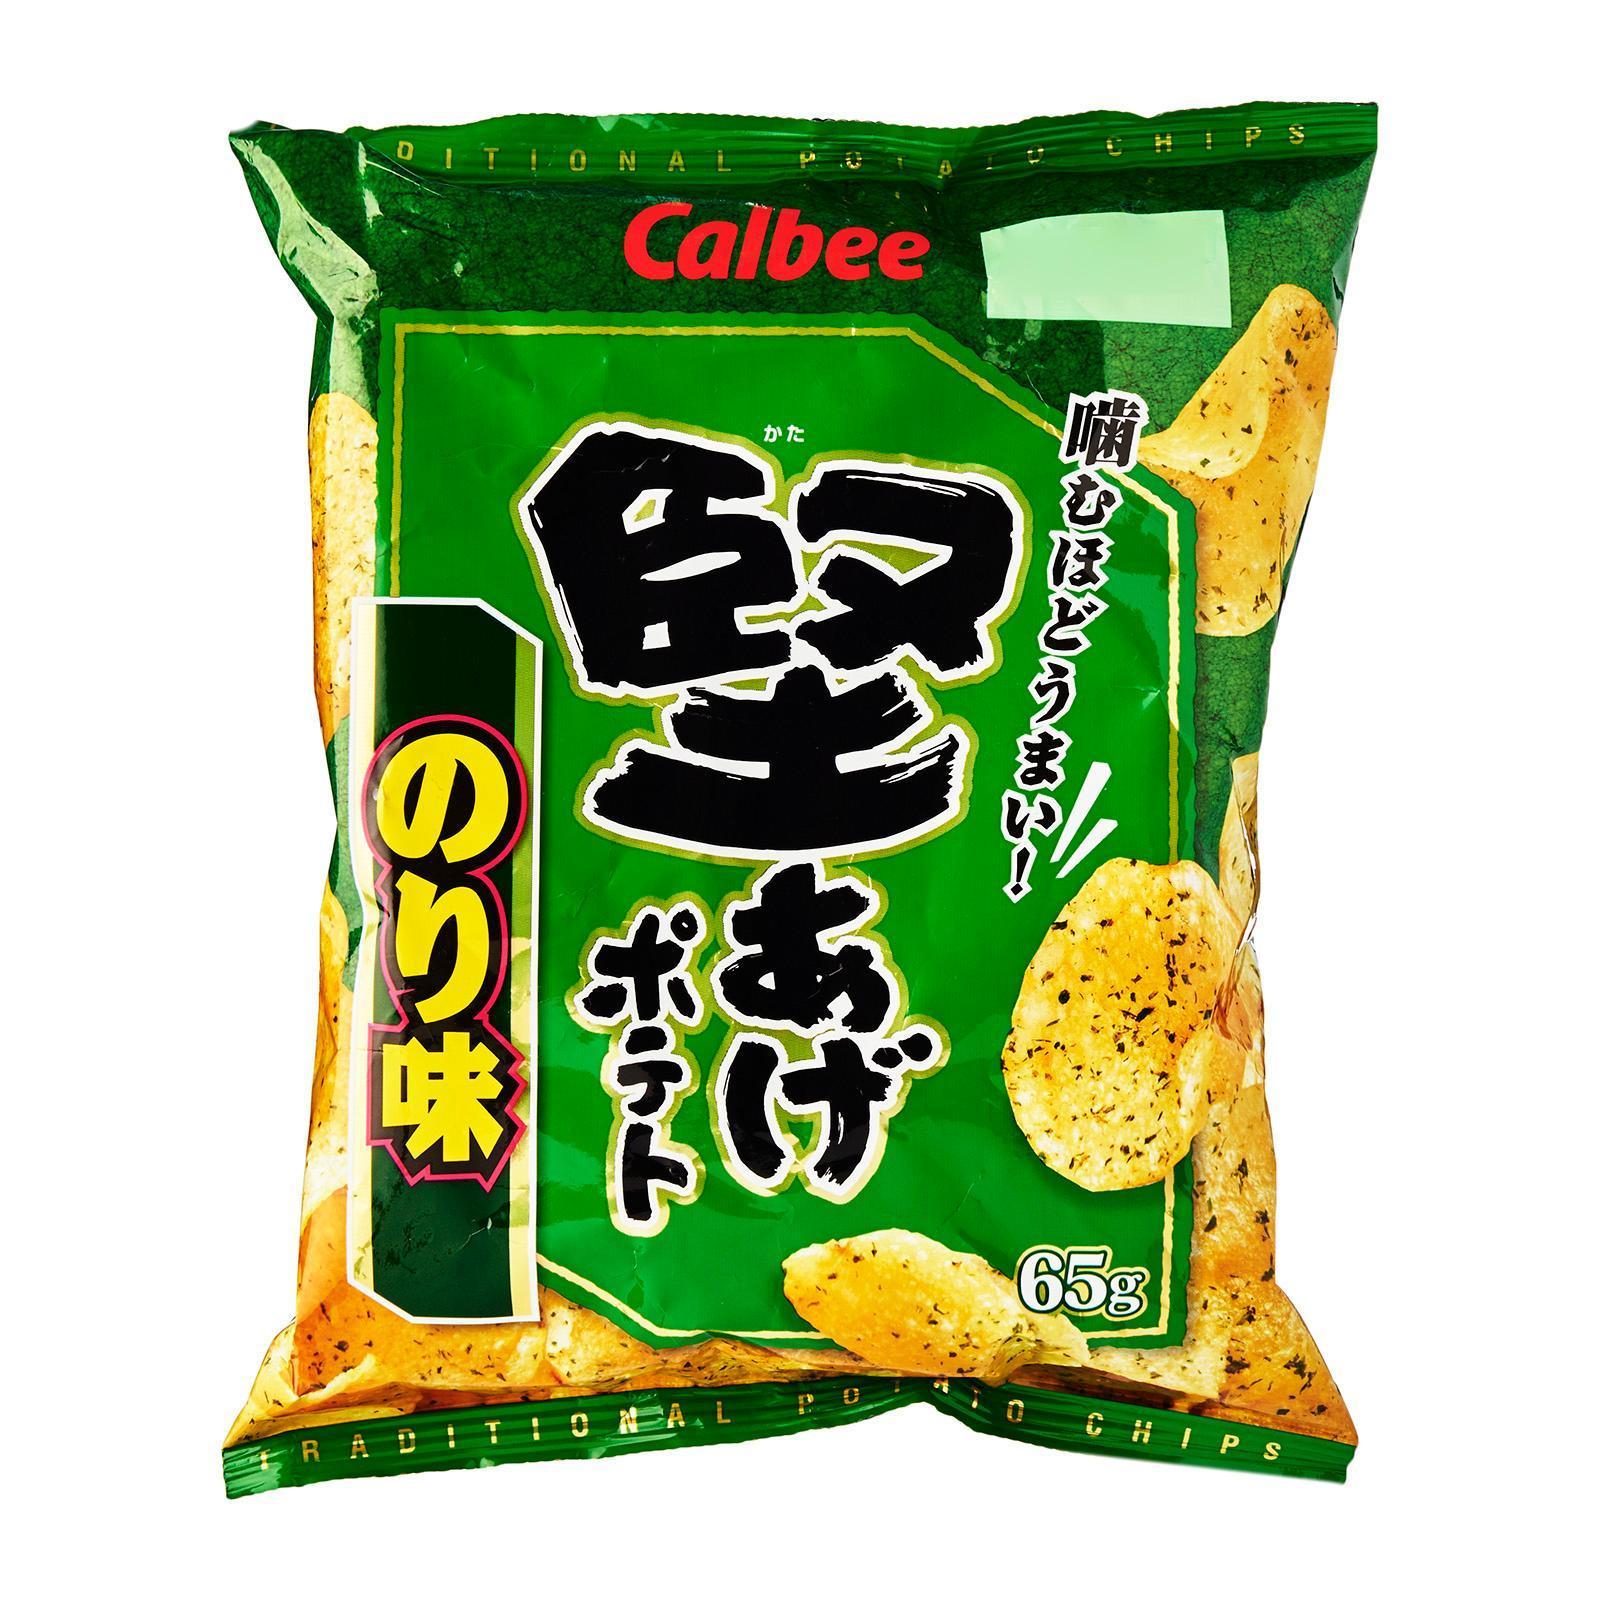 Calbee Kataage Salt and Seaweed Flavored Snack